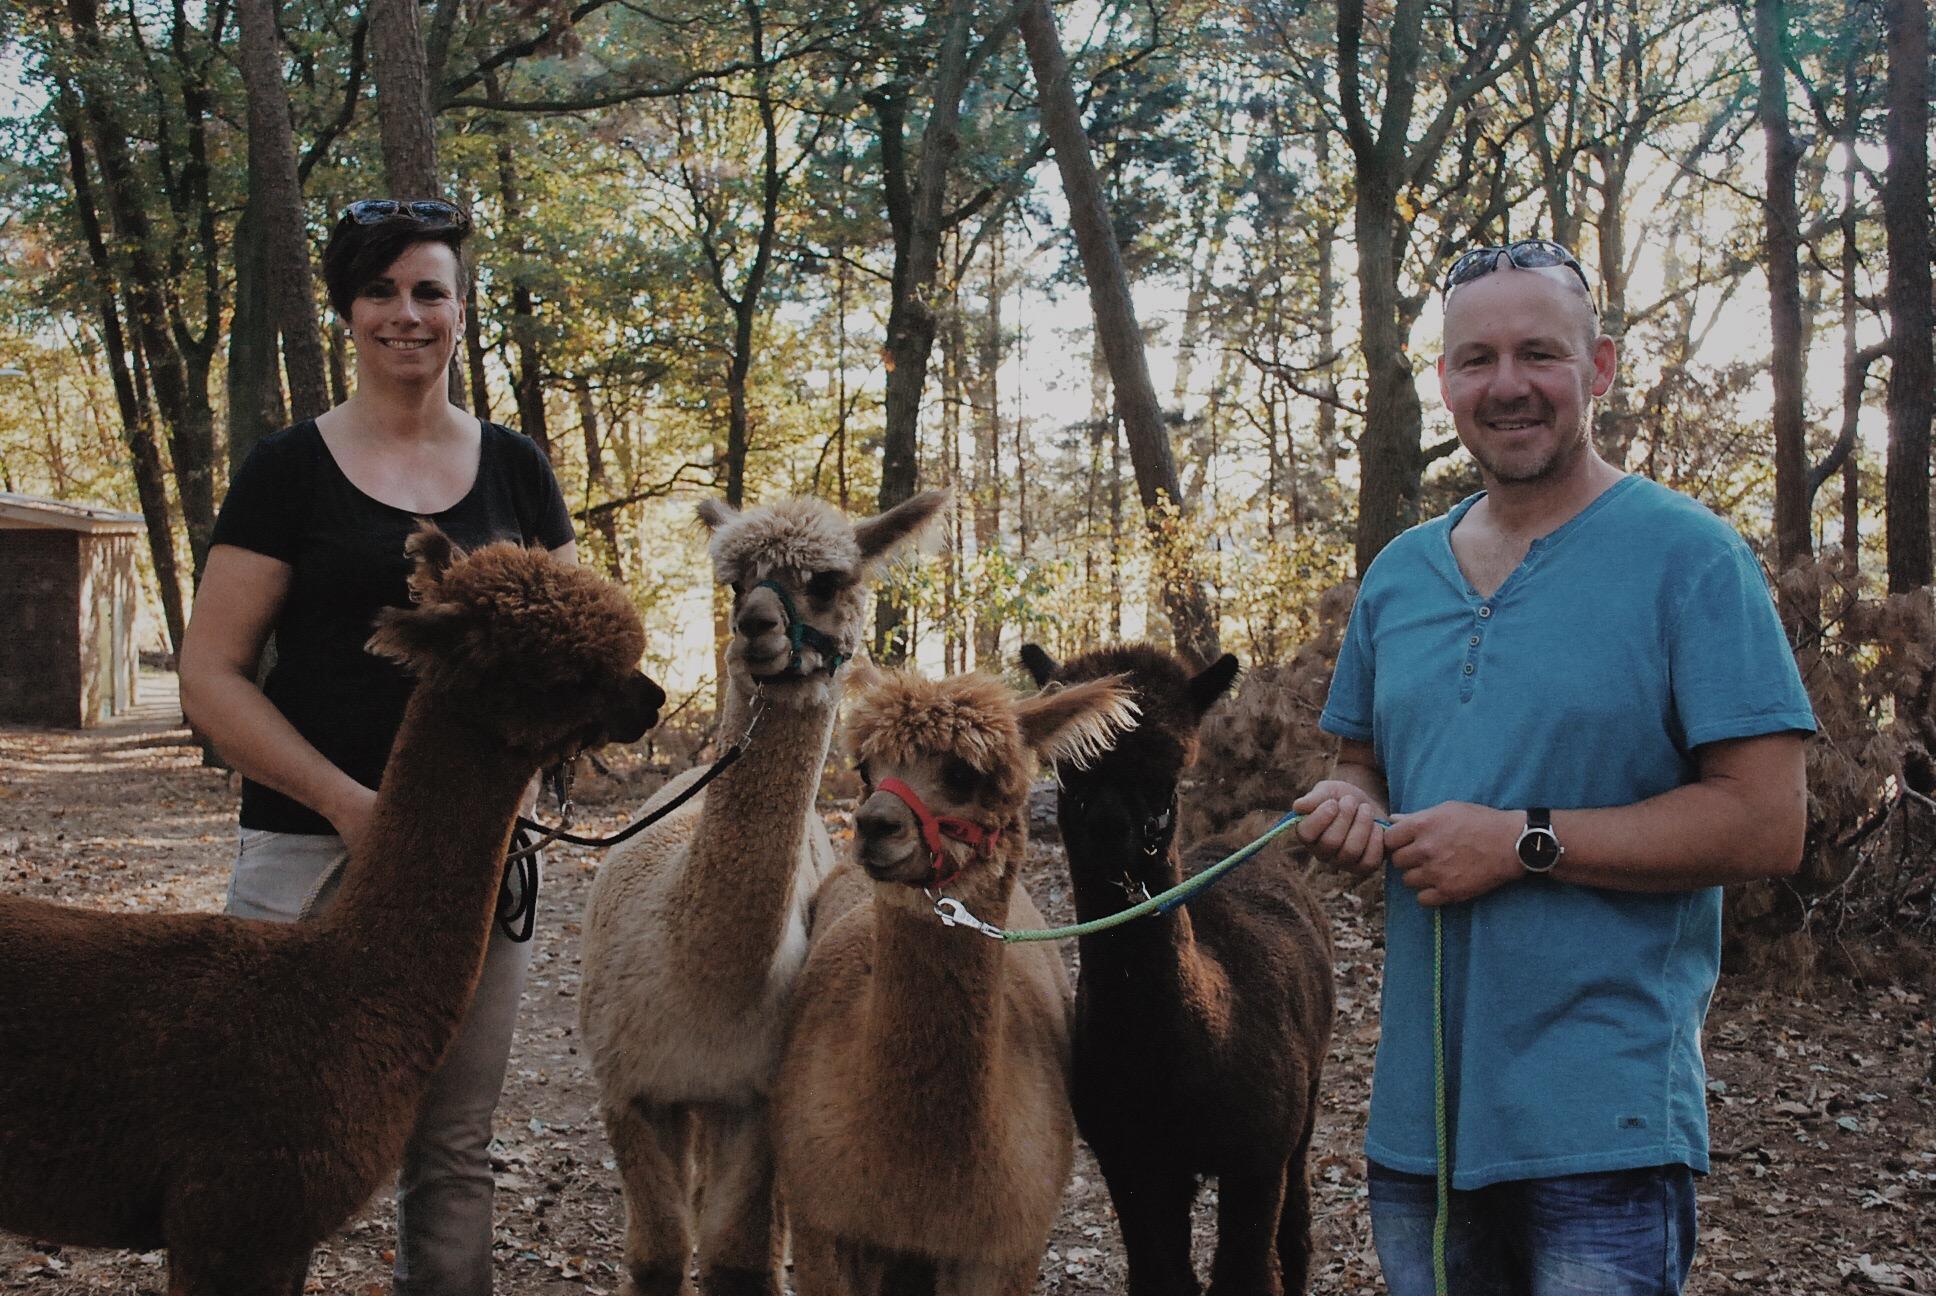 Zomertip: Alpaca Ranch d'n Achterhoek